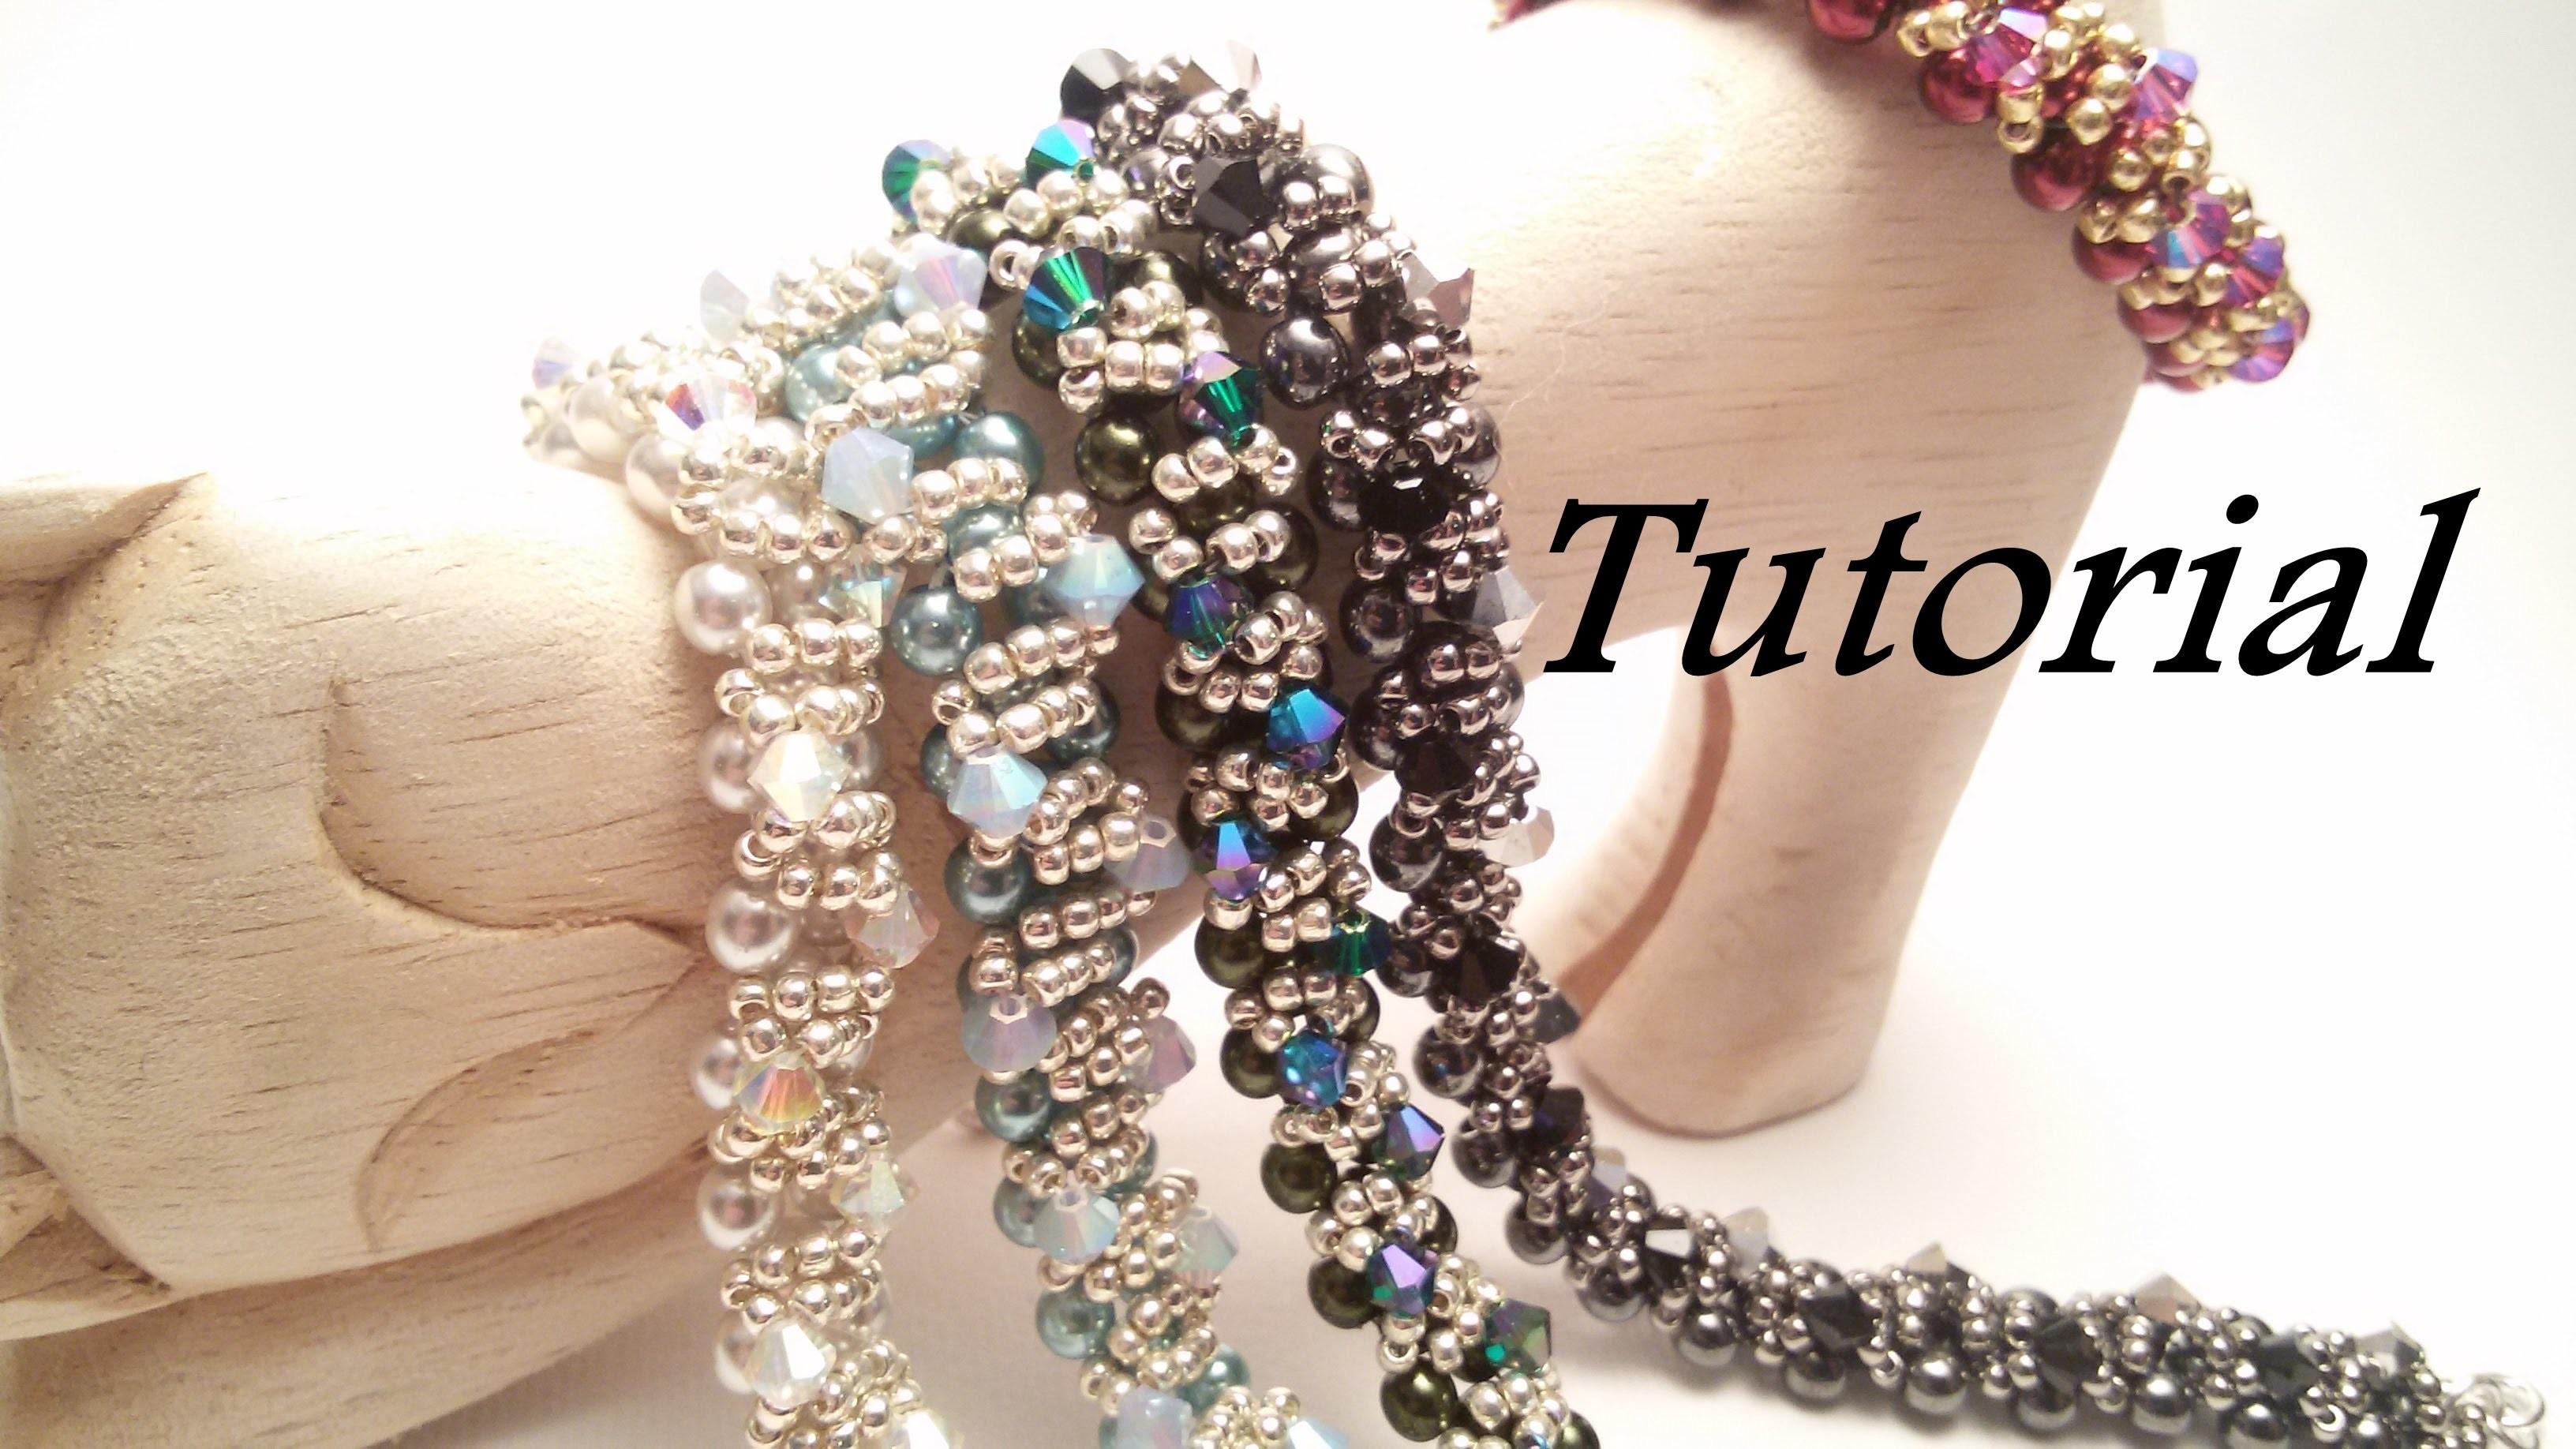 TUTORIAL Bracciale Ghirlanda con Perle Preciosa e Bicono   Christmas bracelet TUTORIAL